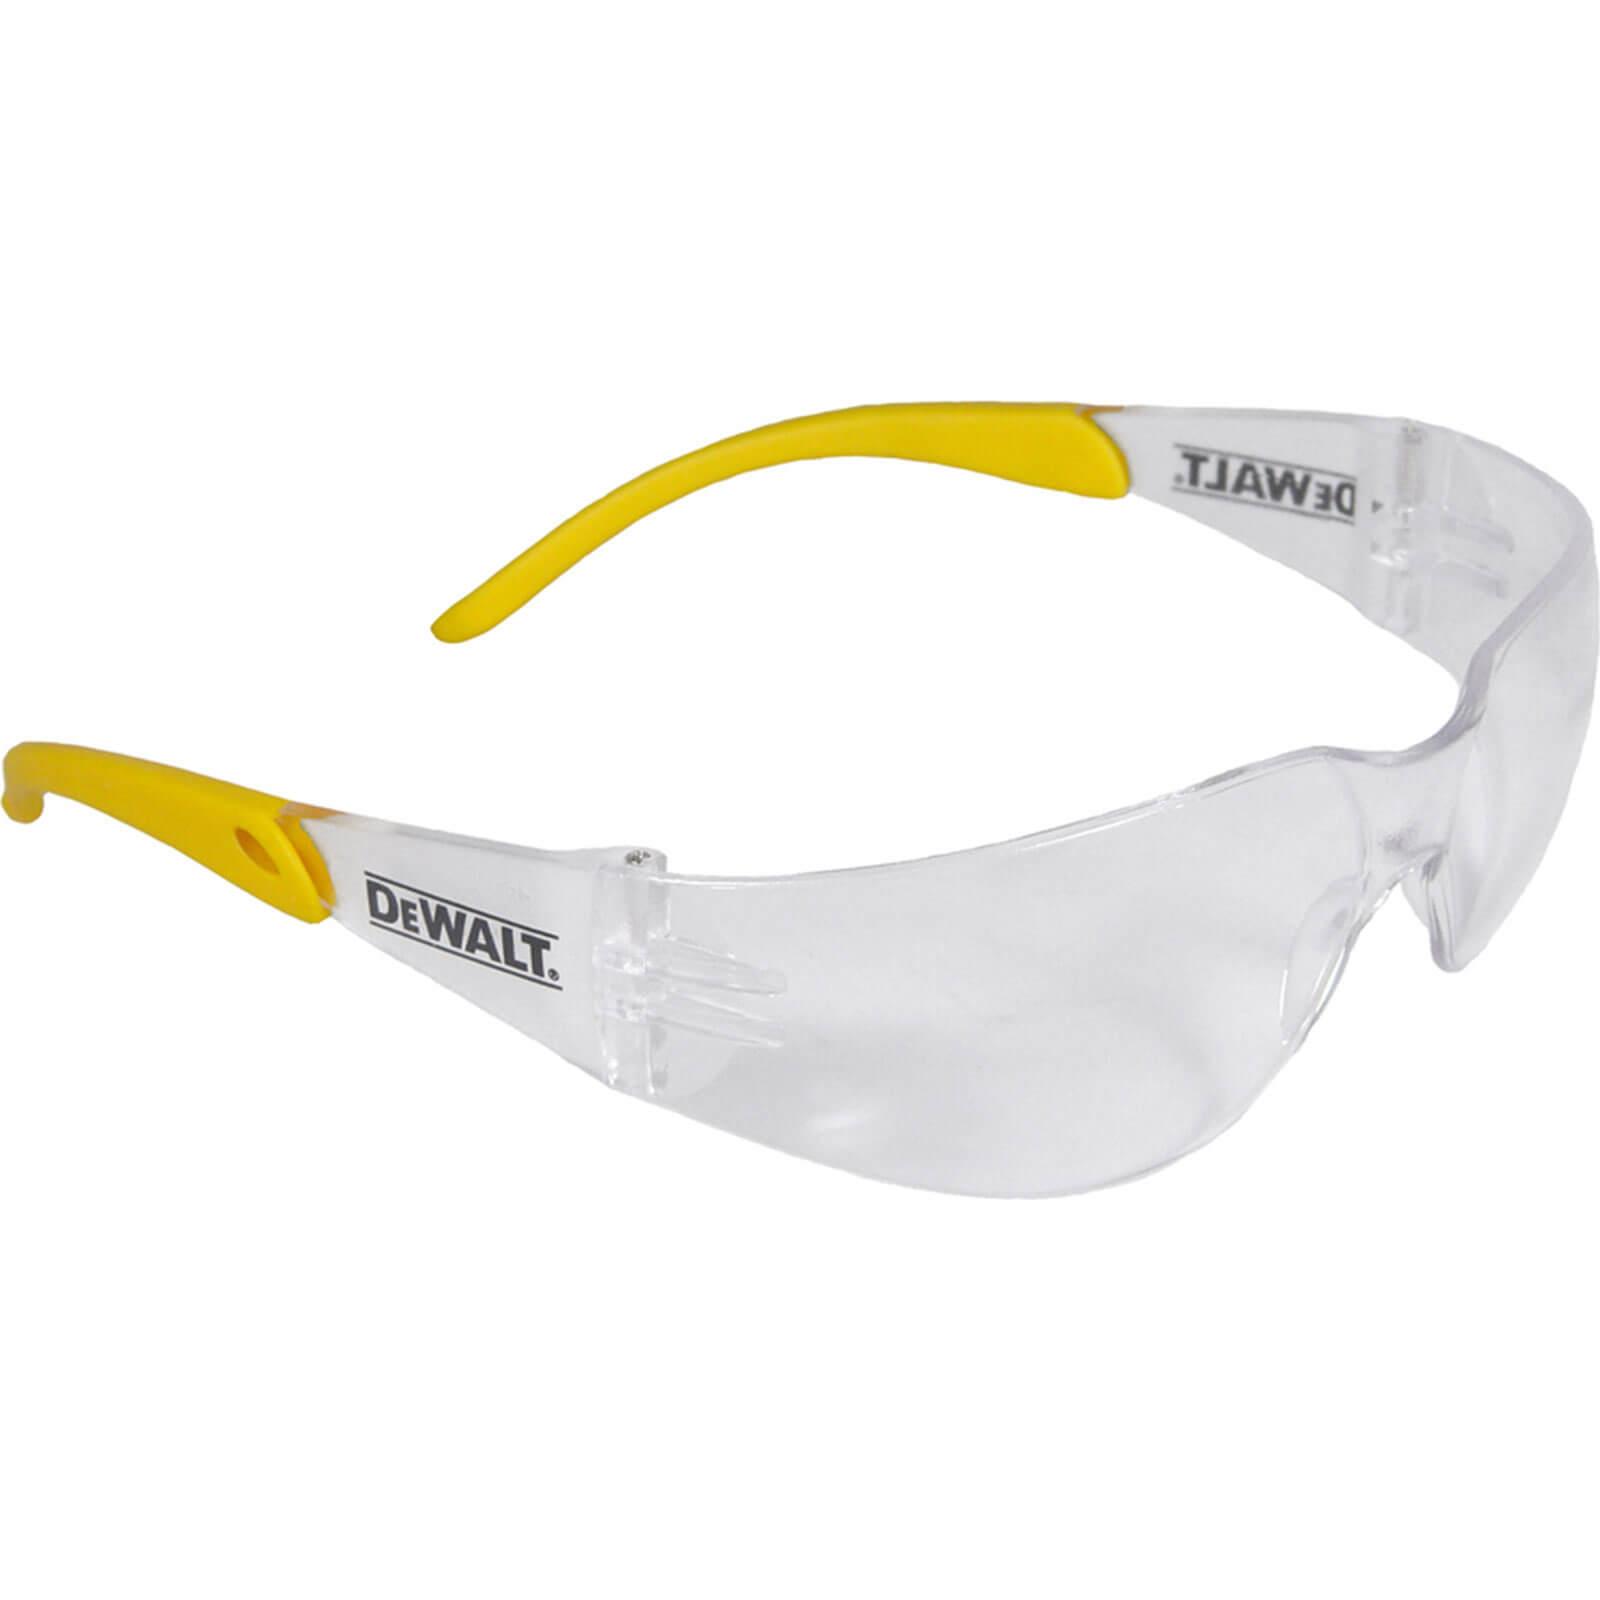 DeWalt Protector Clear Safety Glasses